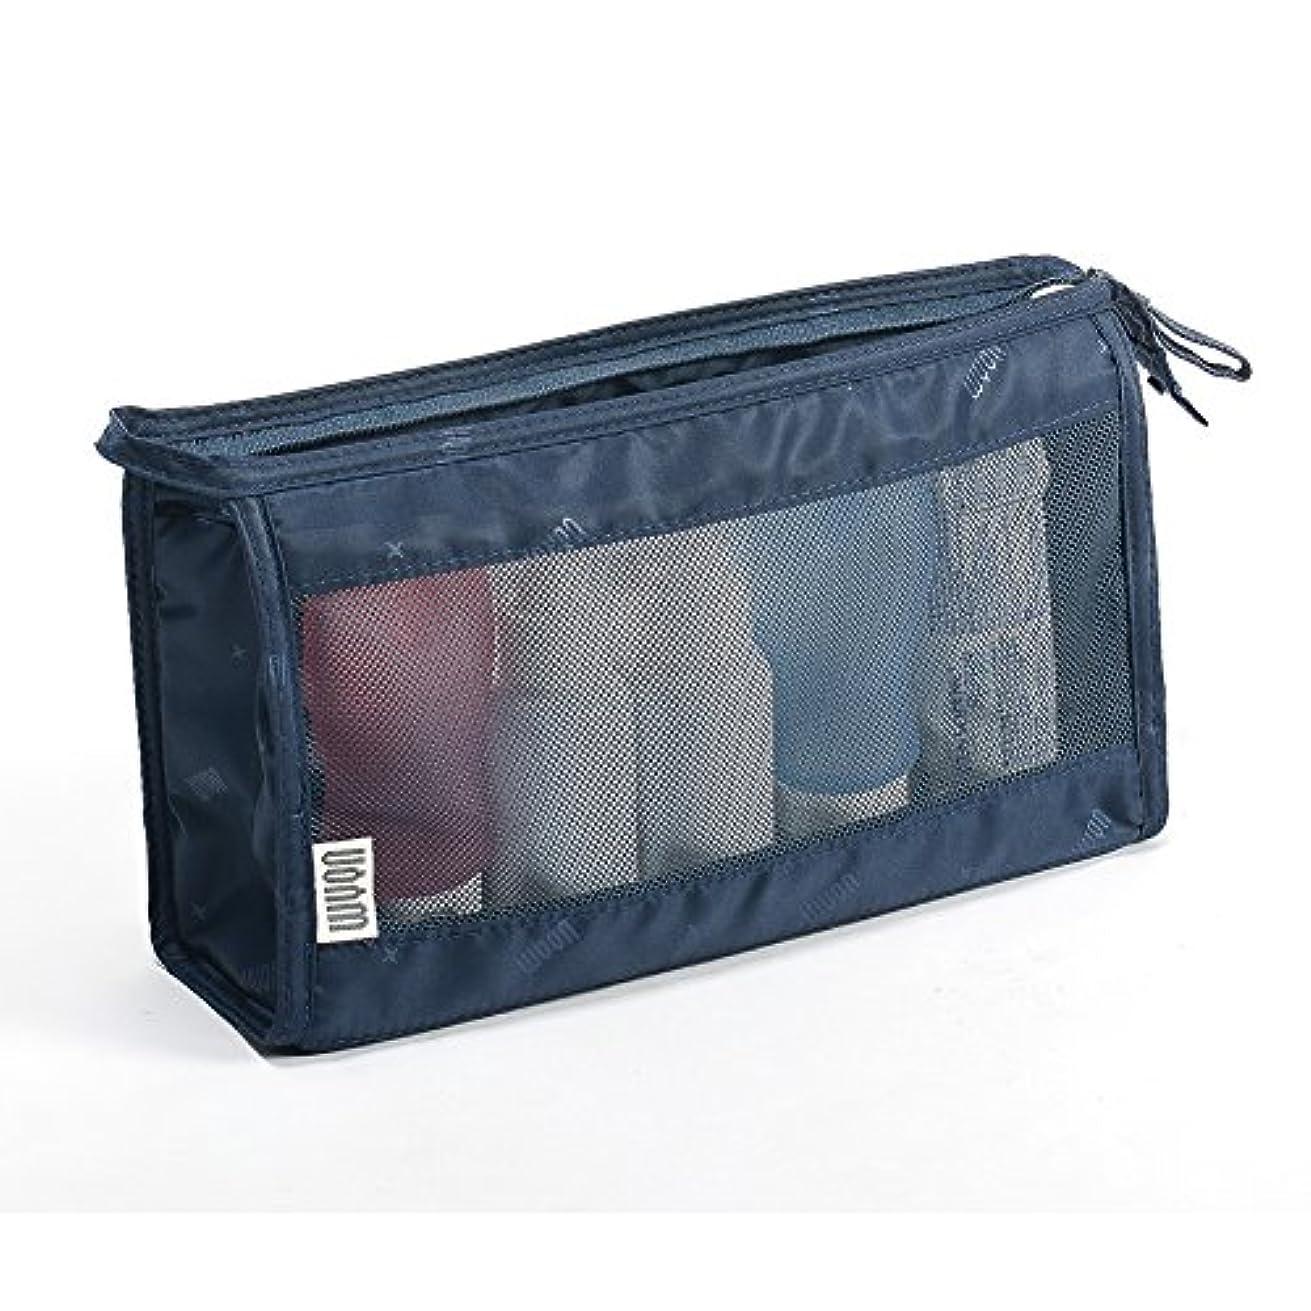 WYQN トラベルポーチ メッシュ 旅行用化粧ポーチ トイレタリー整理バッグ 洗面用具入れ 軽量 便利 ネイビー